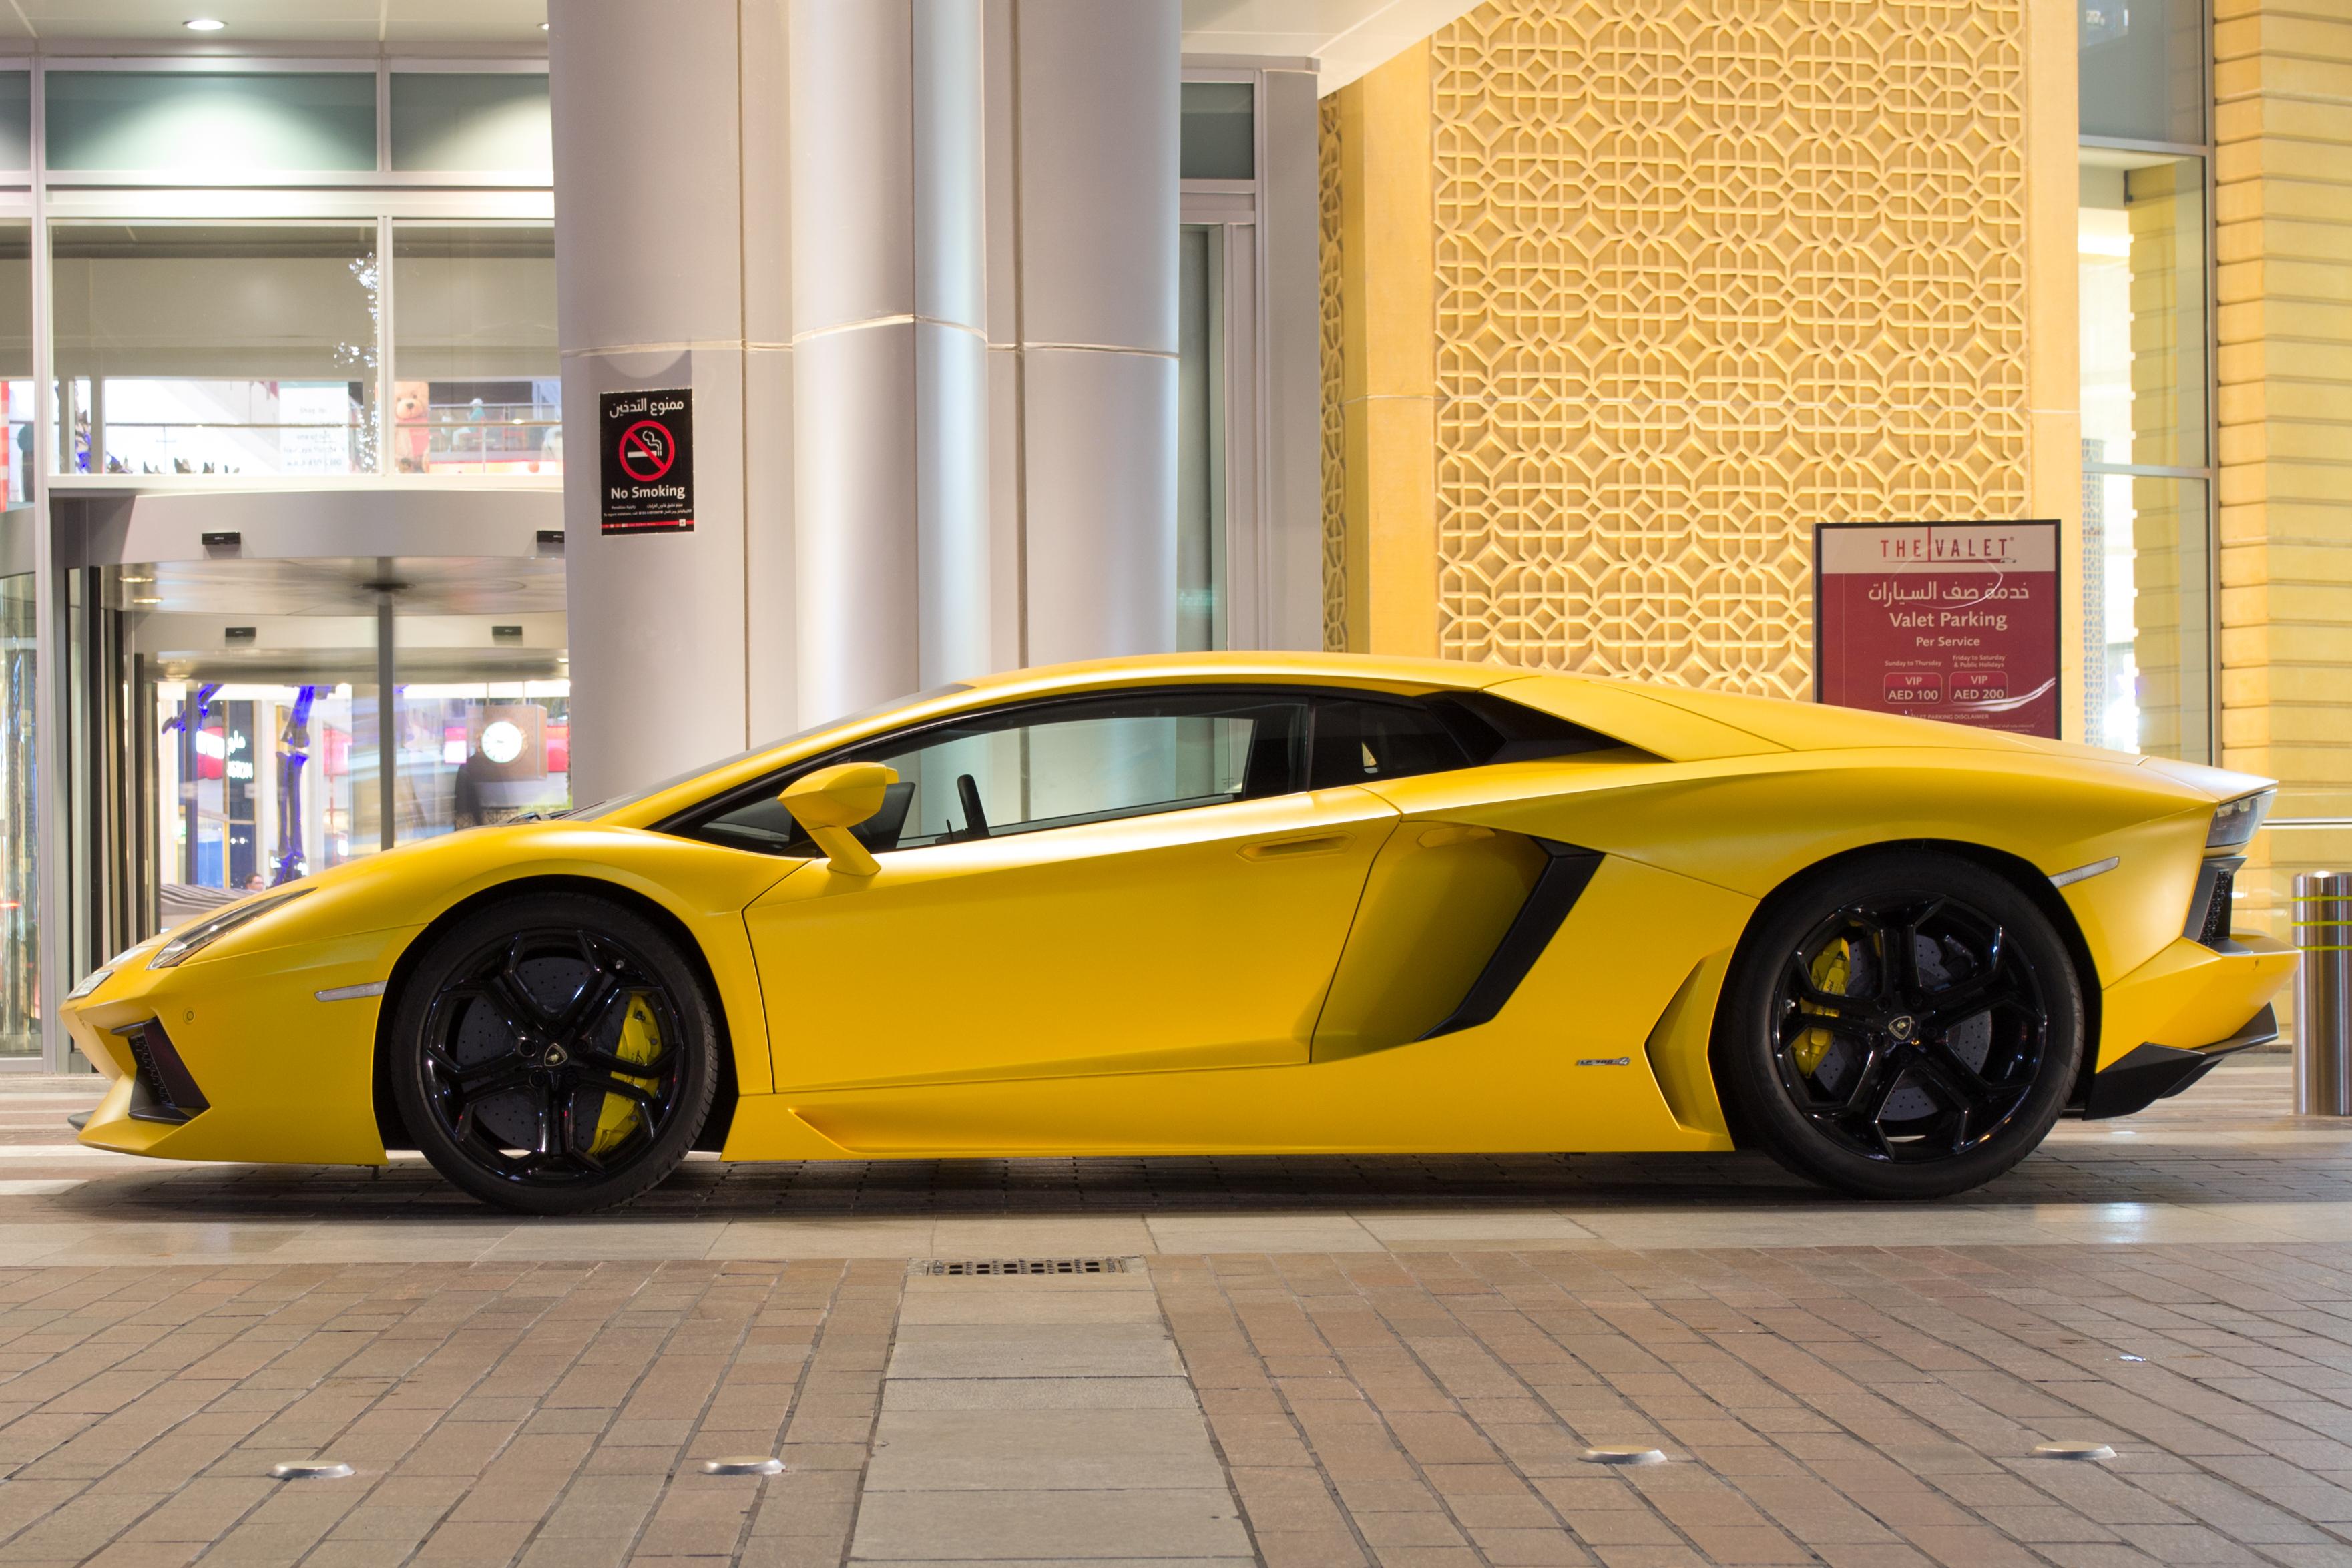 Wallpaper : yellow, Lamborghini Aventador, Nikon, Dubai, Lamborghini ...